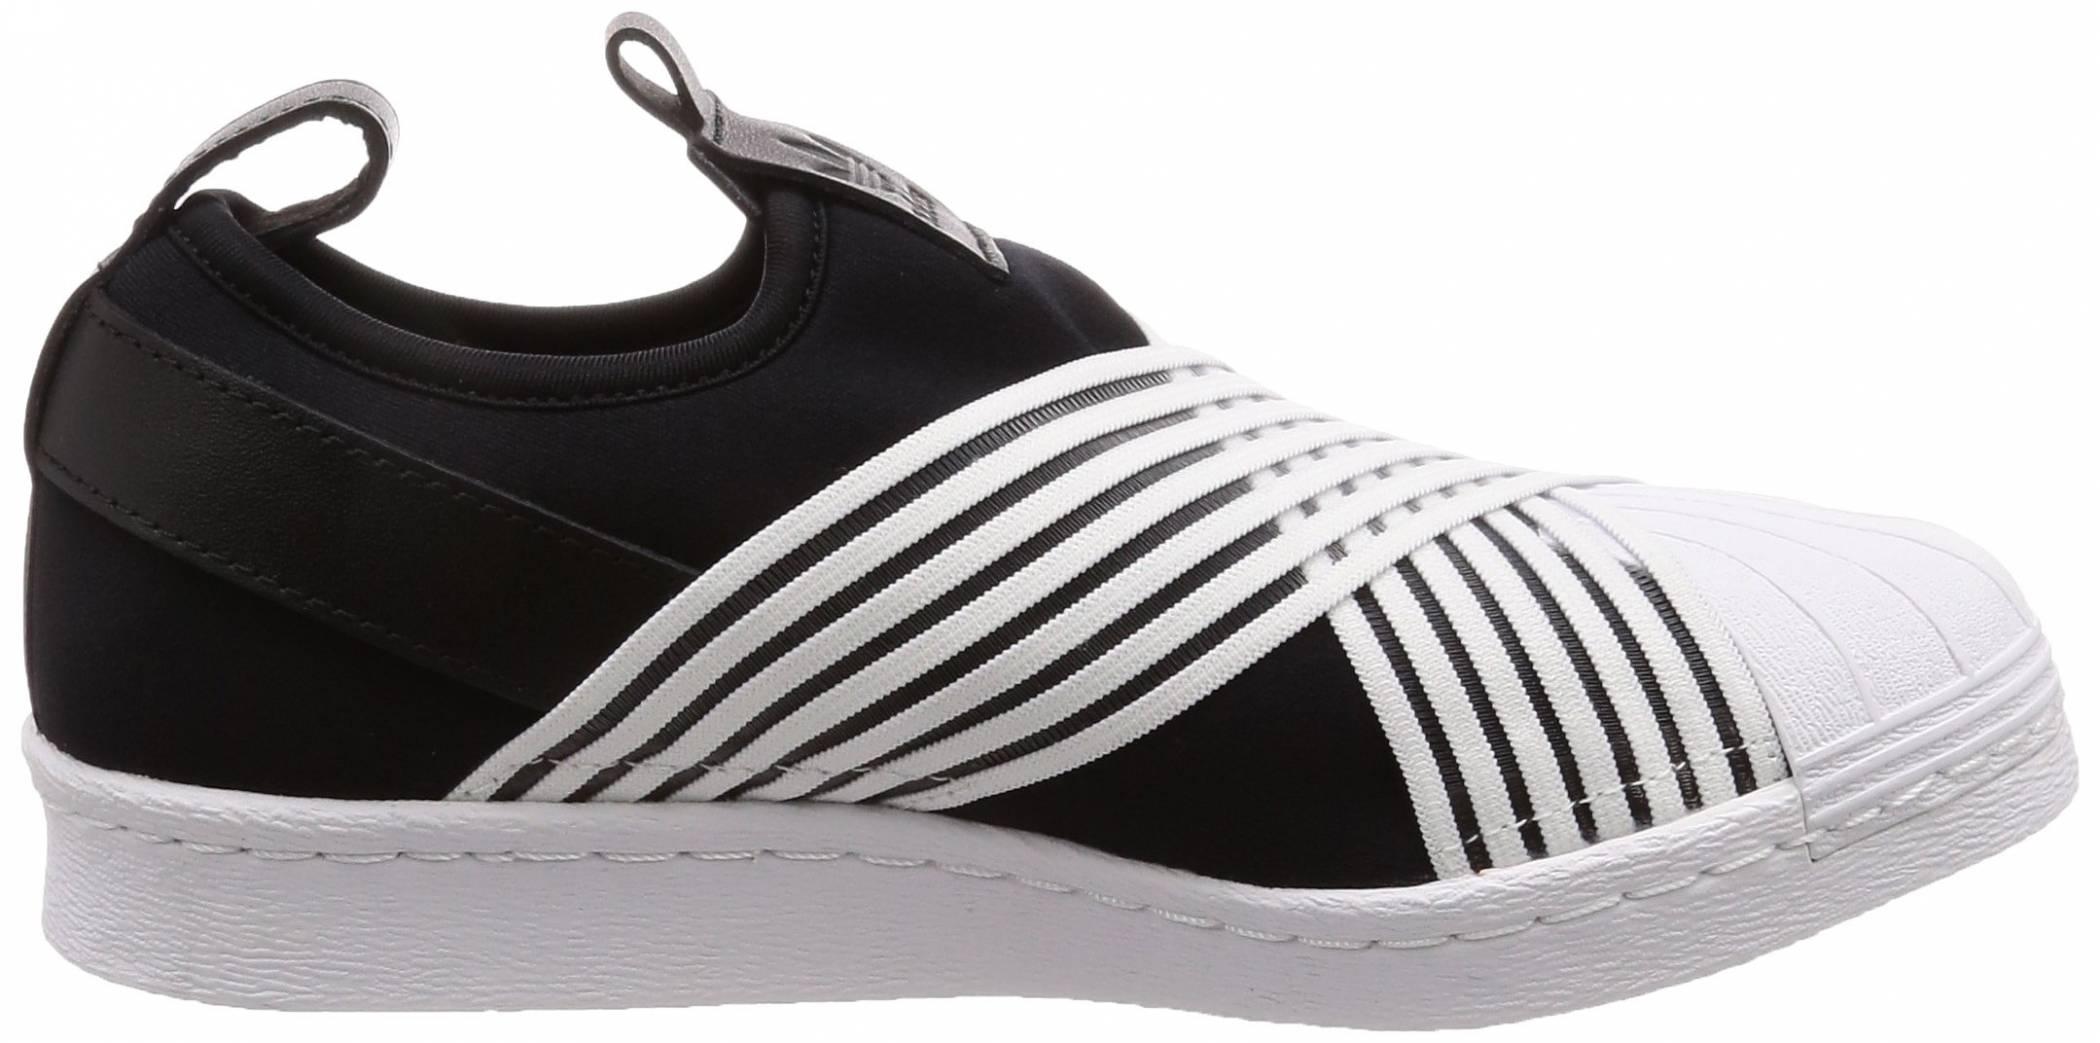 Adidas Superstar Slip-On кроссовки